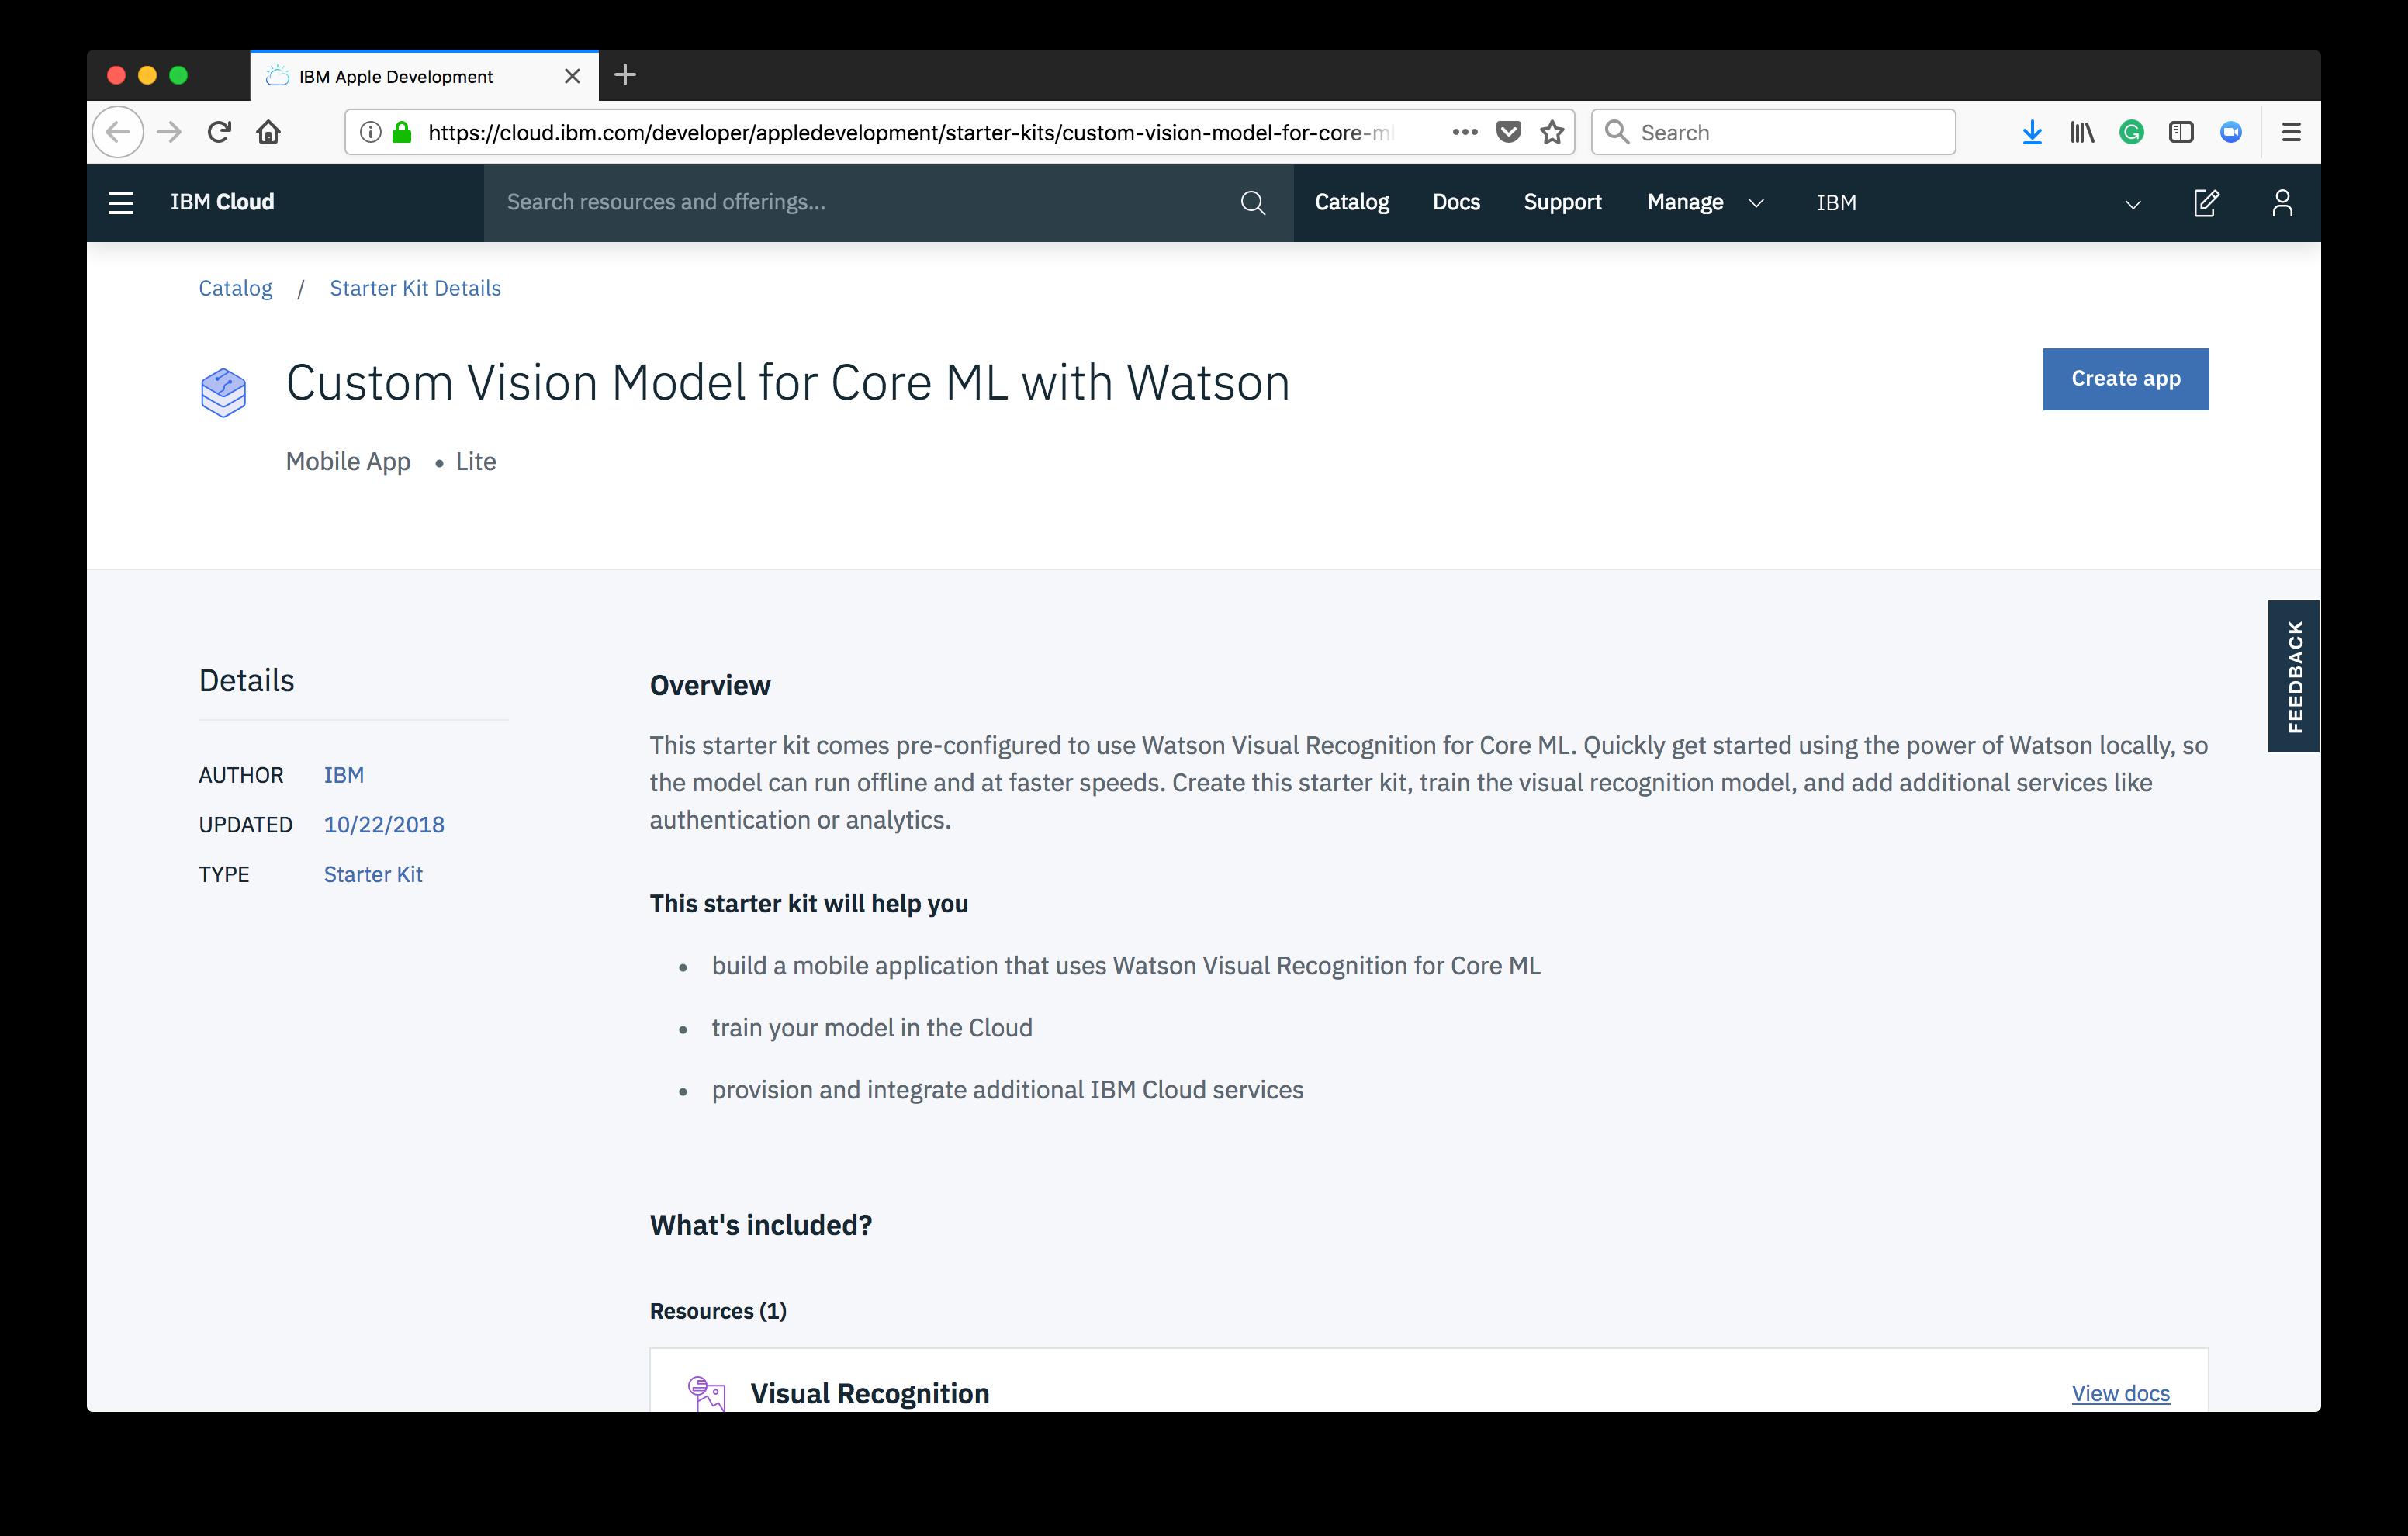 Watson_welcome_screen